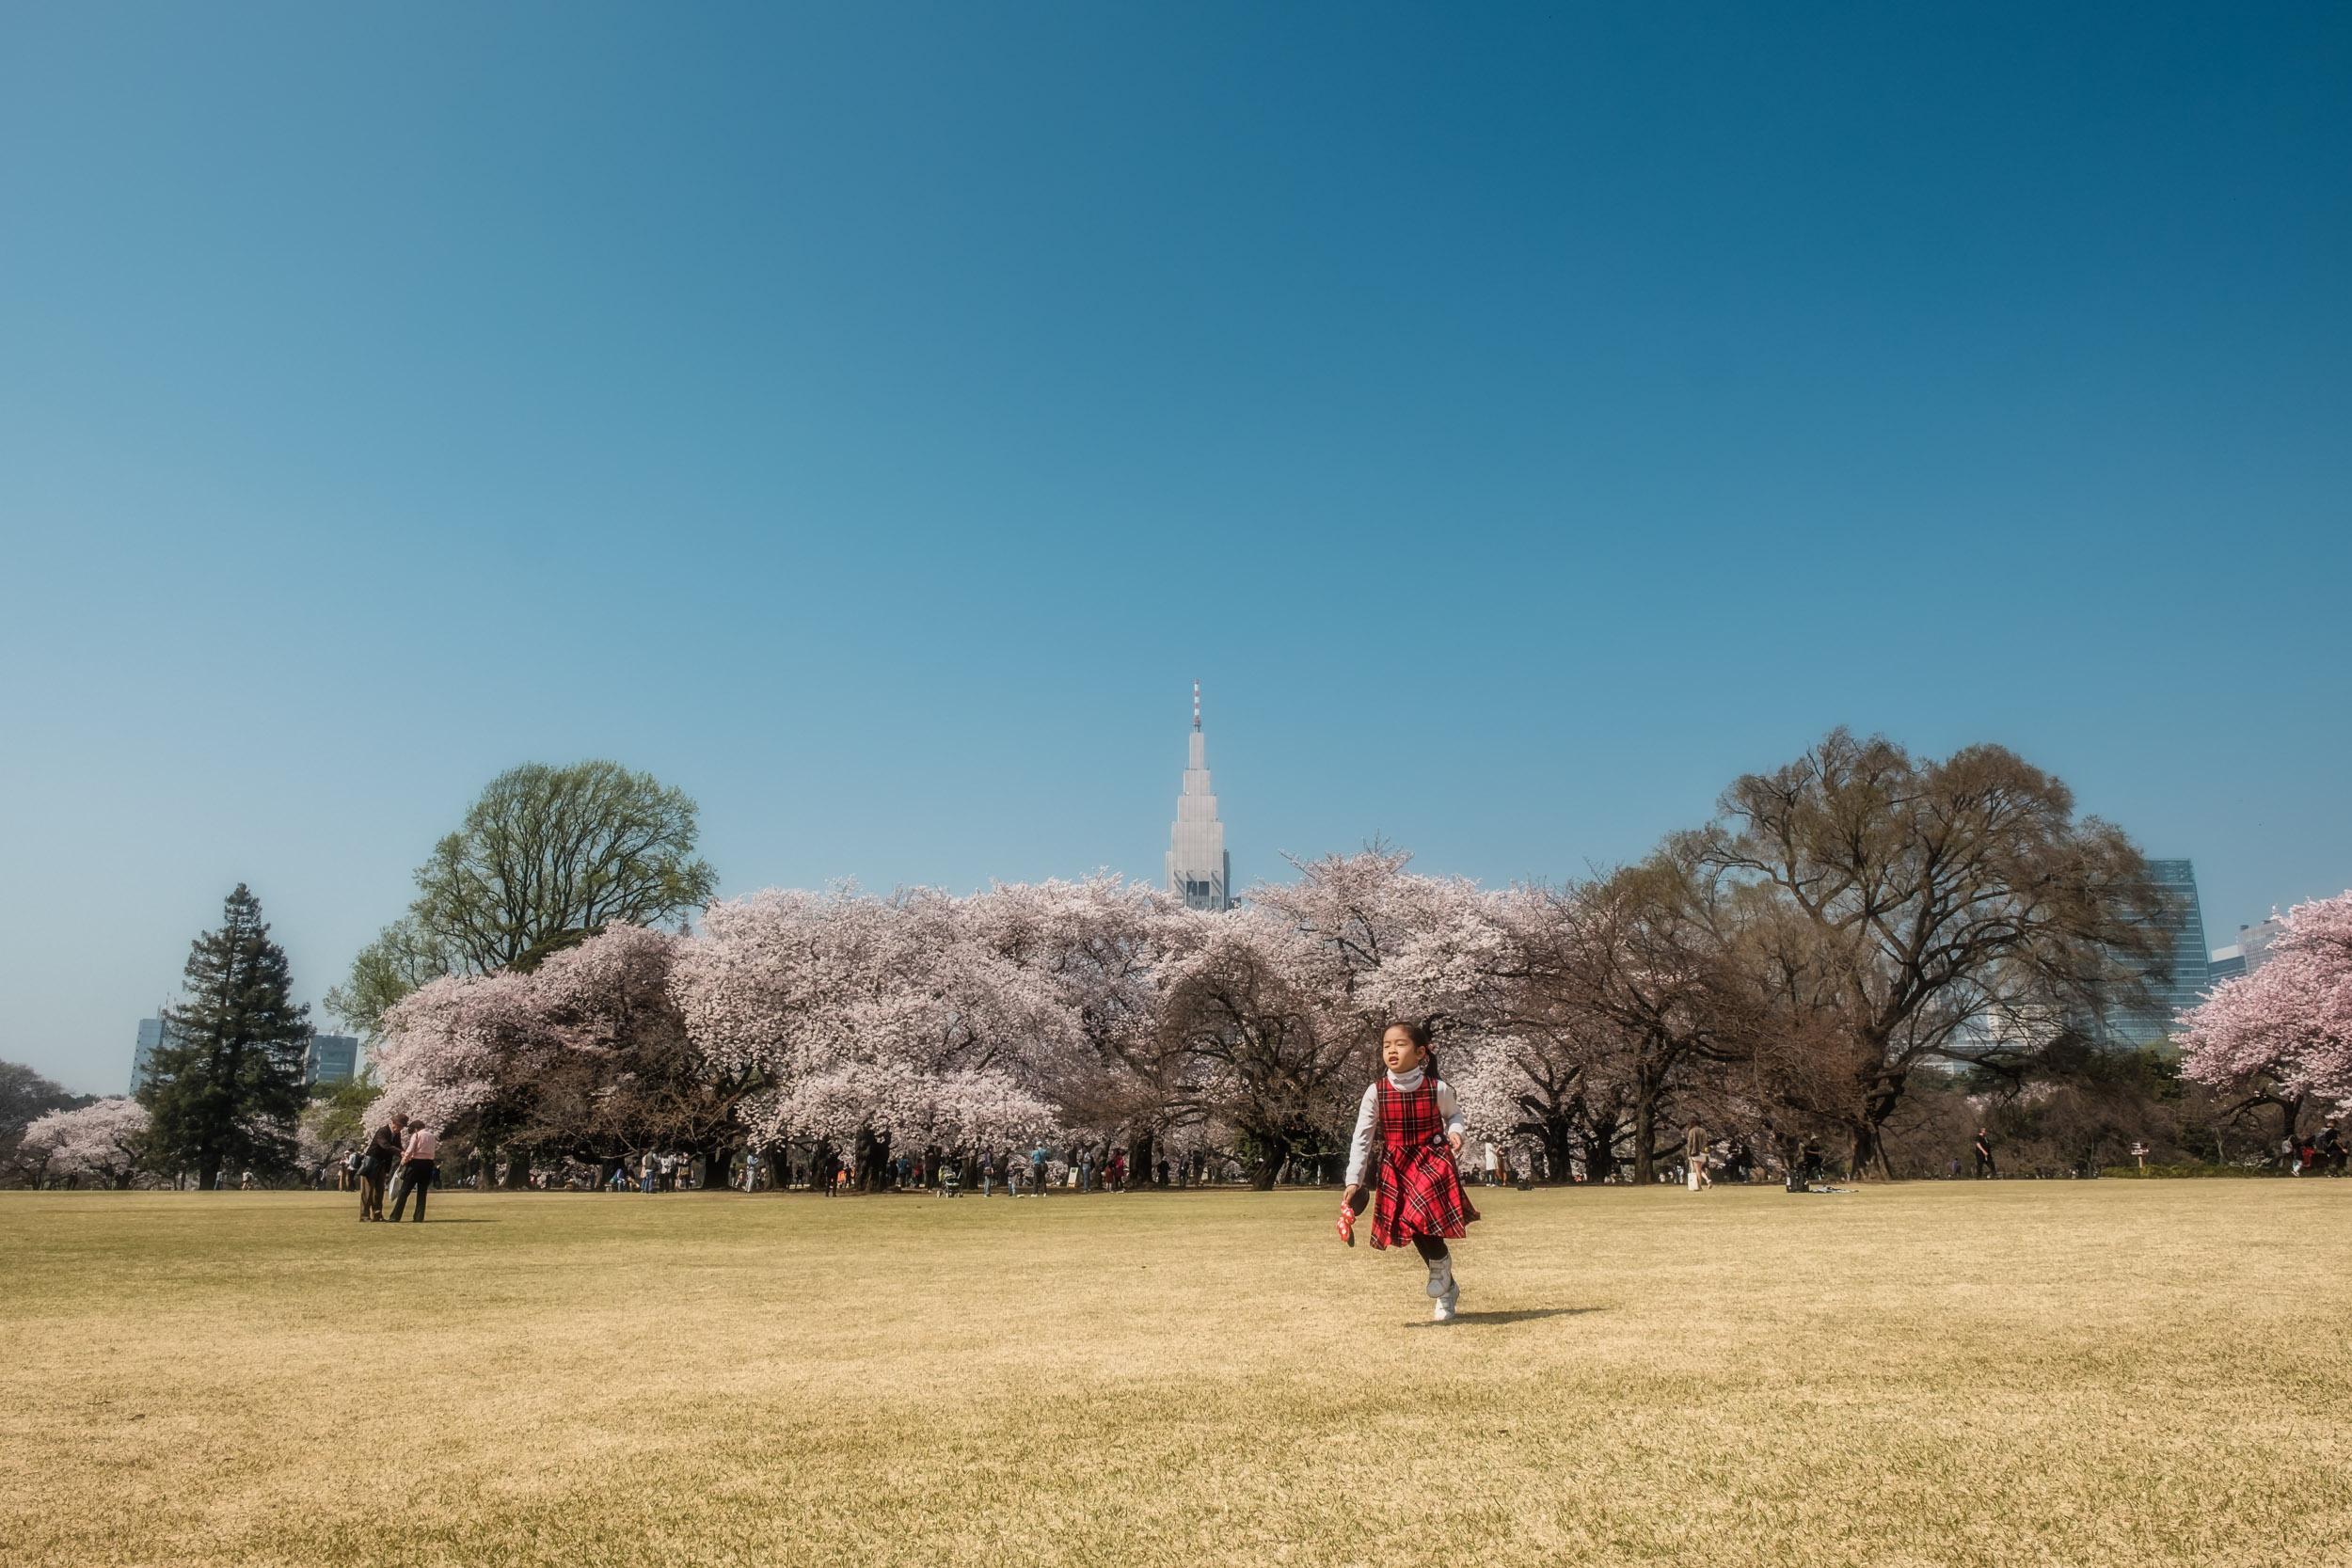 Shinjuku Gyoen, cherry blossoms, the NTT DOCOMO Building and one kid running free